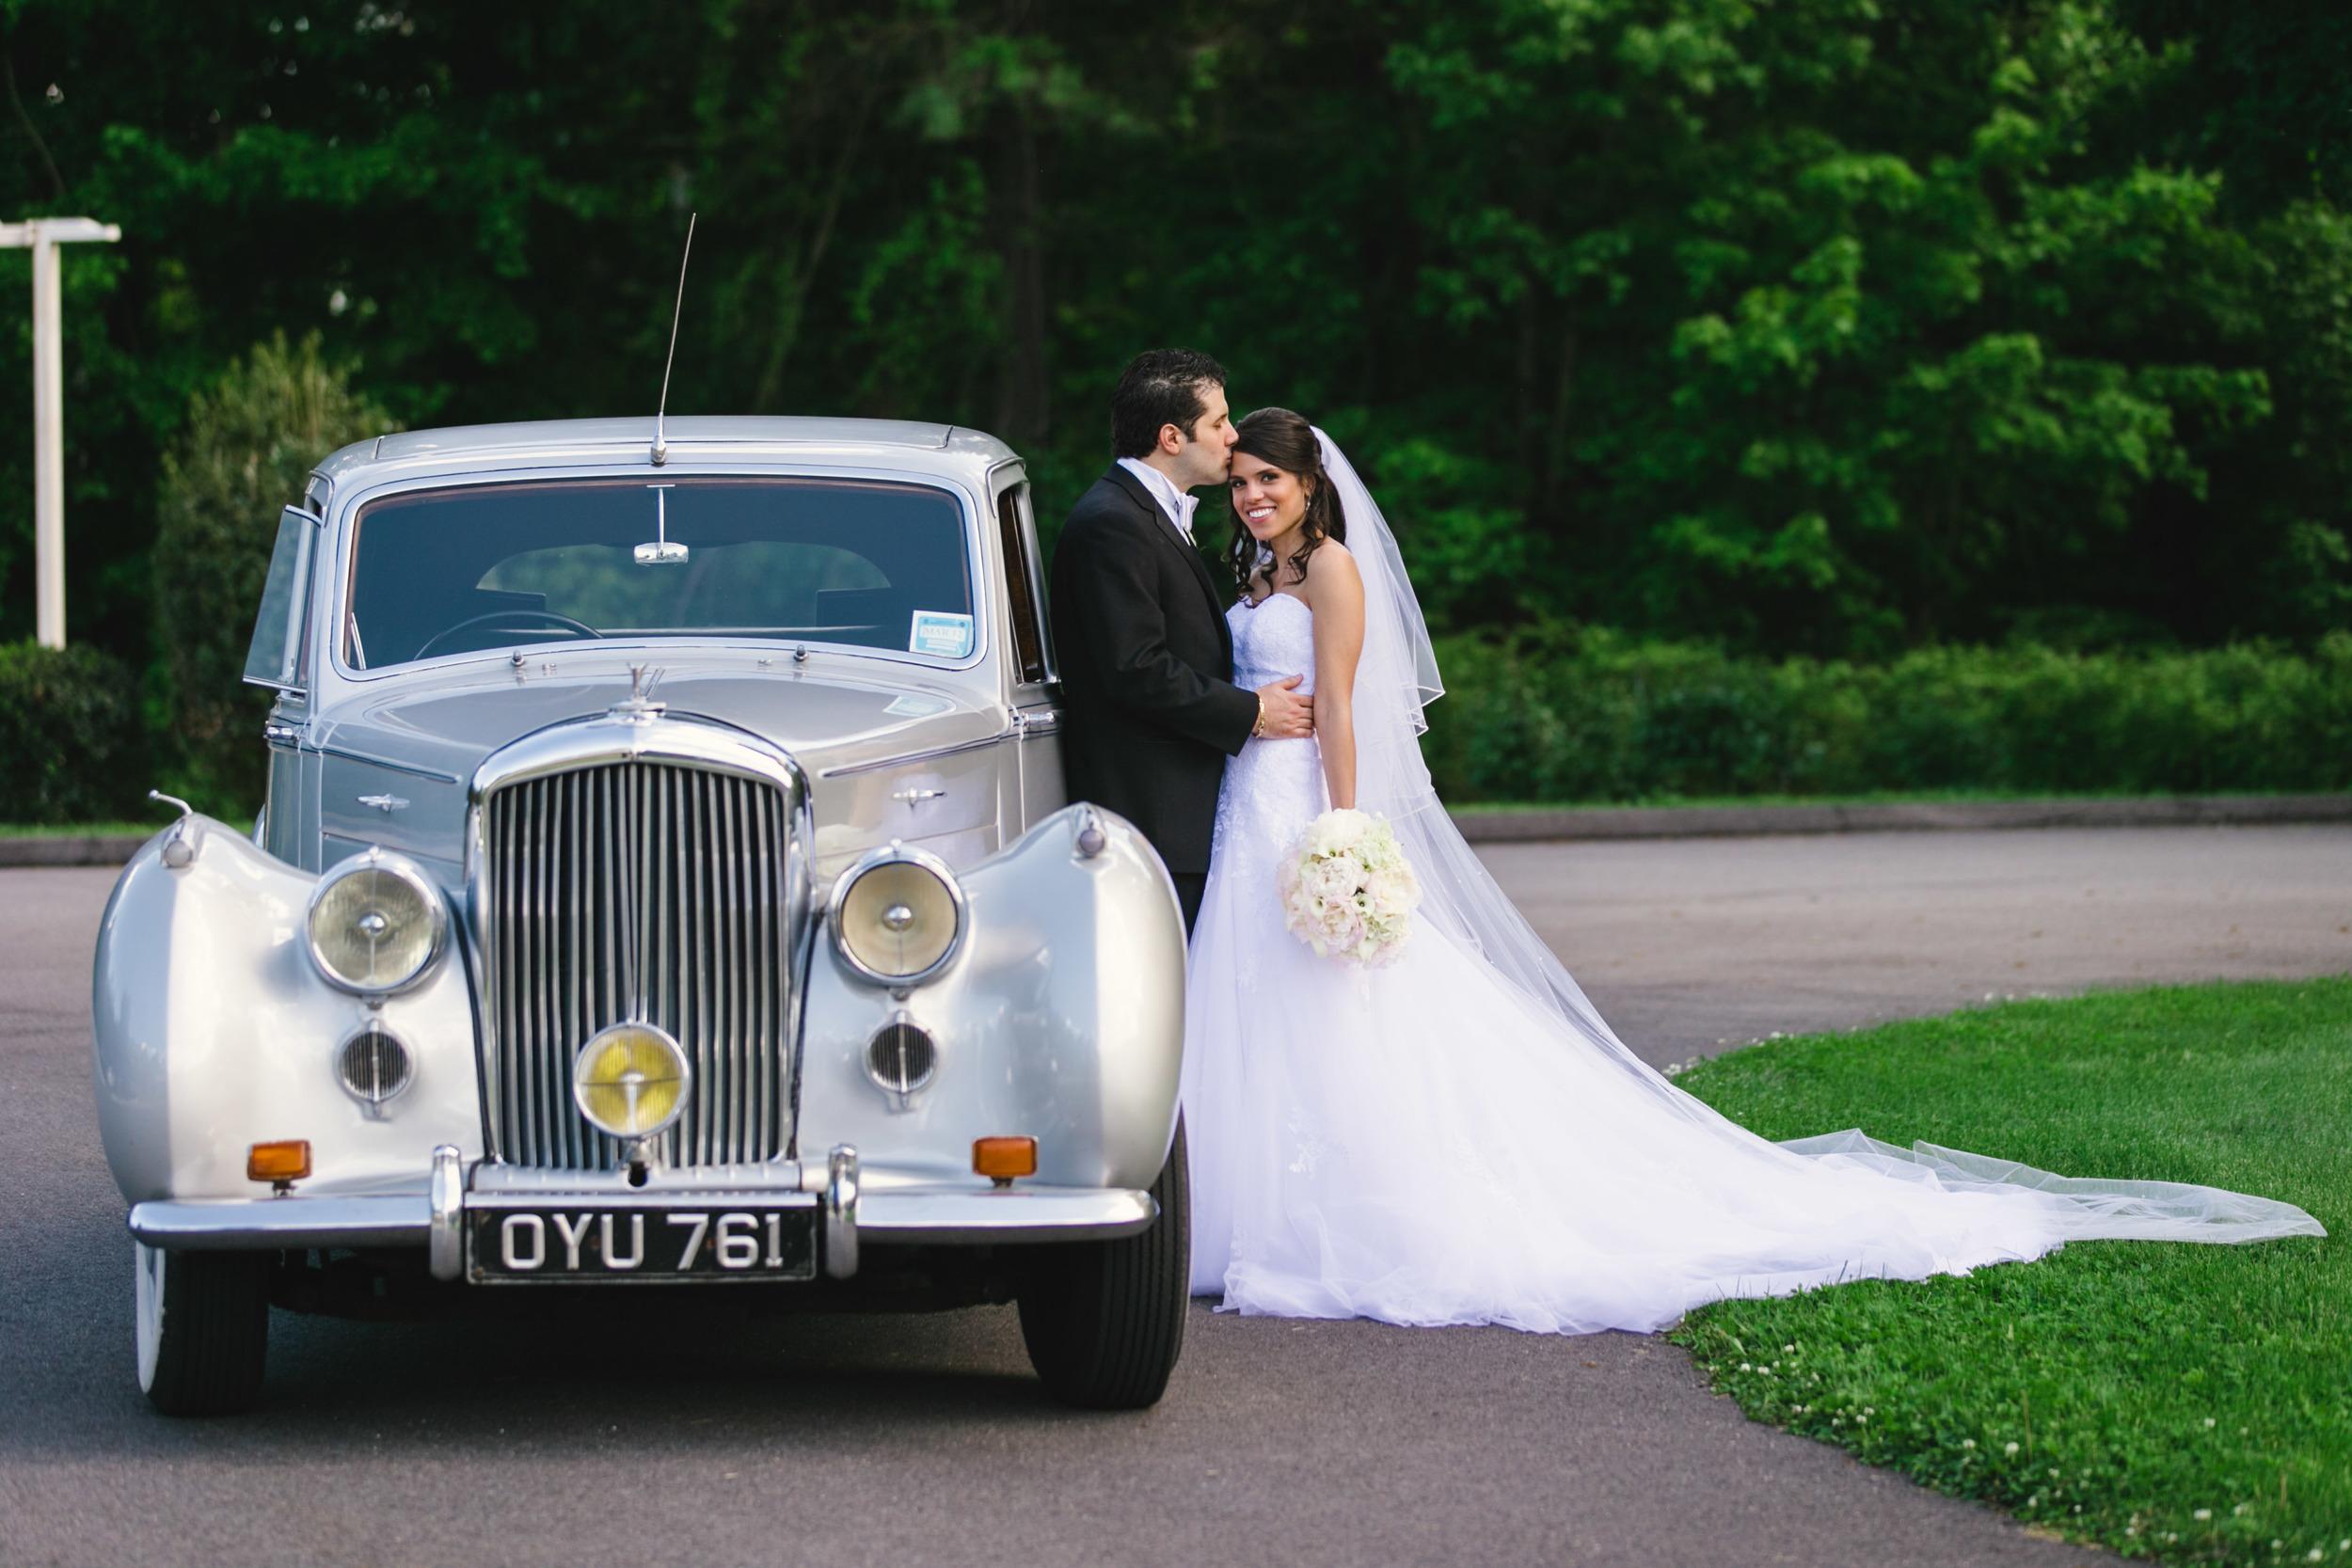 Romantic-Italian-Wedding-Aria-Prospect-Connecticut-Creative-Photography-Jacek-Dolata-9.jpg